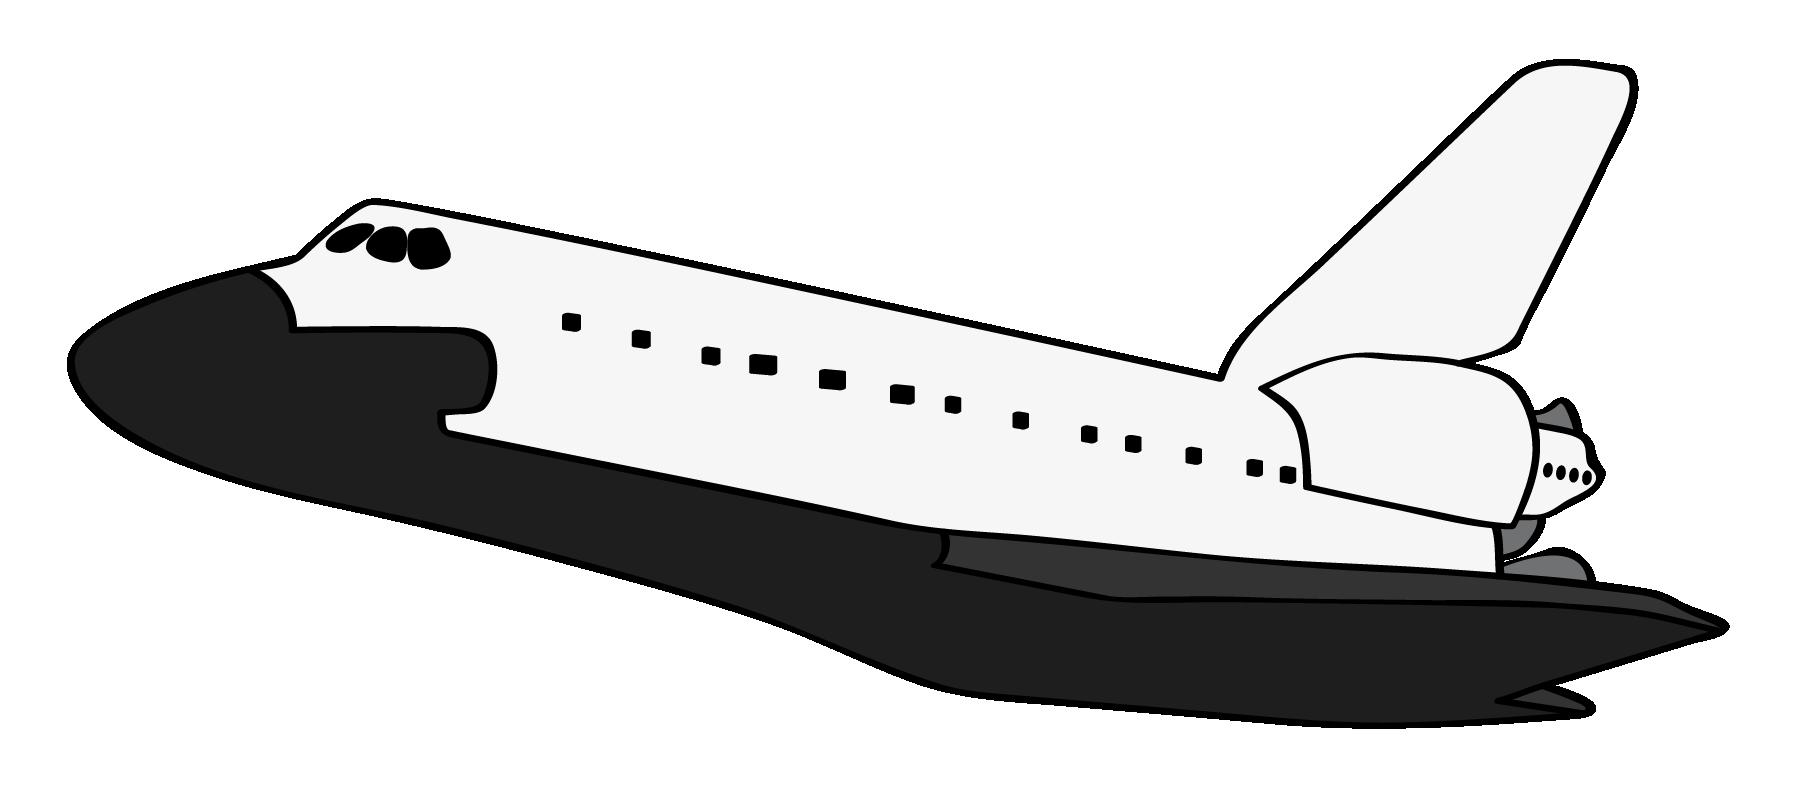 1817x803 Space Shuttle Clipart